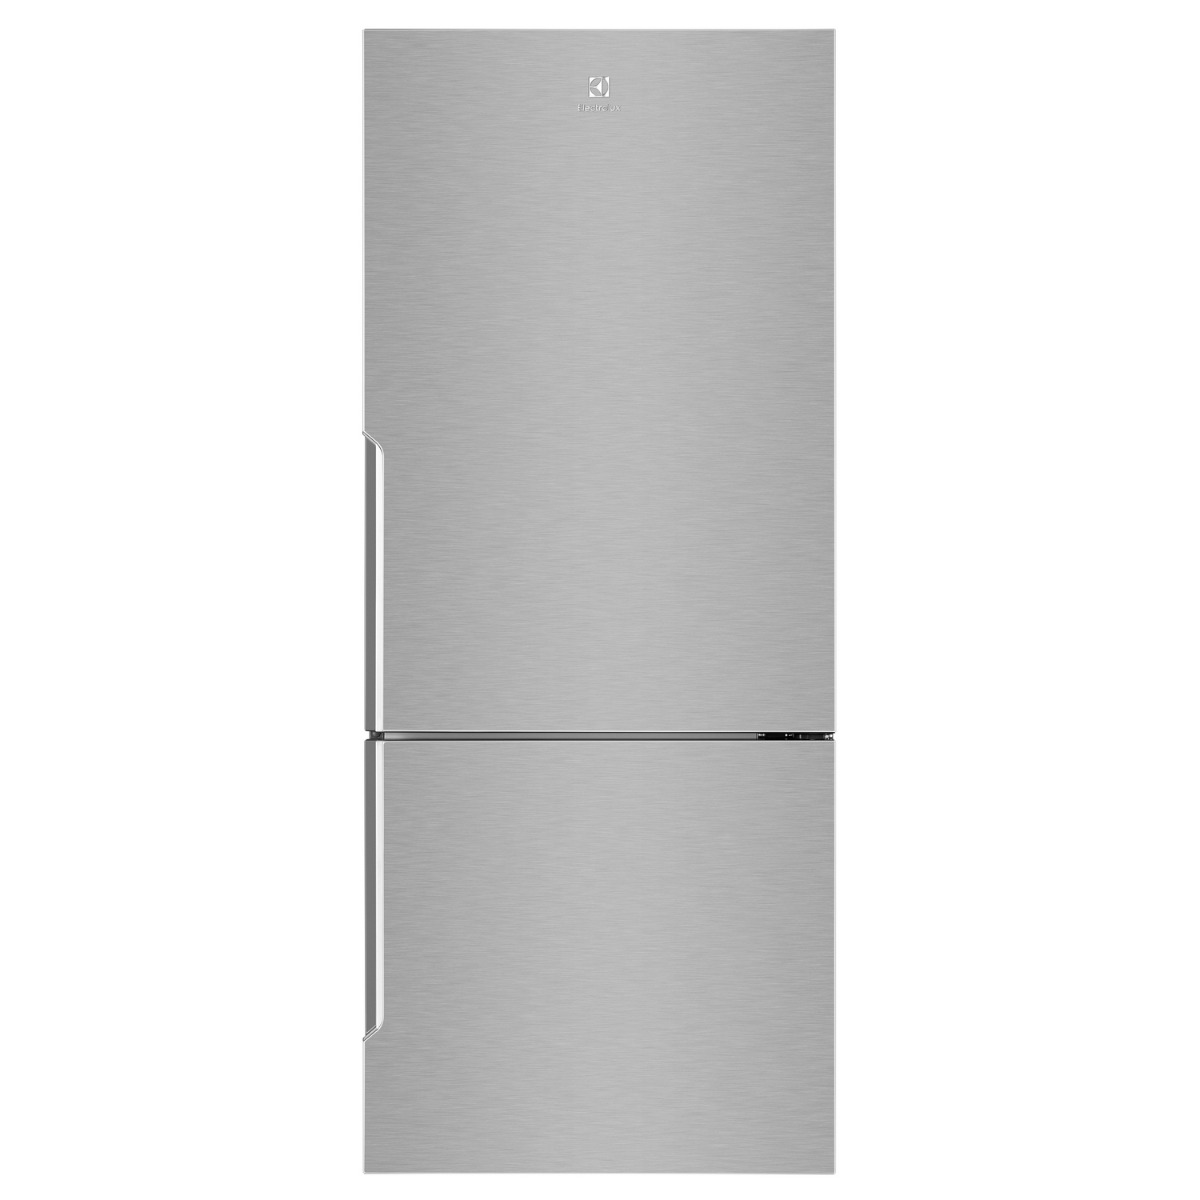 ELECTROLUX ตู้เย็น 2 ประตู (14.8 คิว, สี Arctic Siver) รุ่น EBE4500B-A RTH